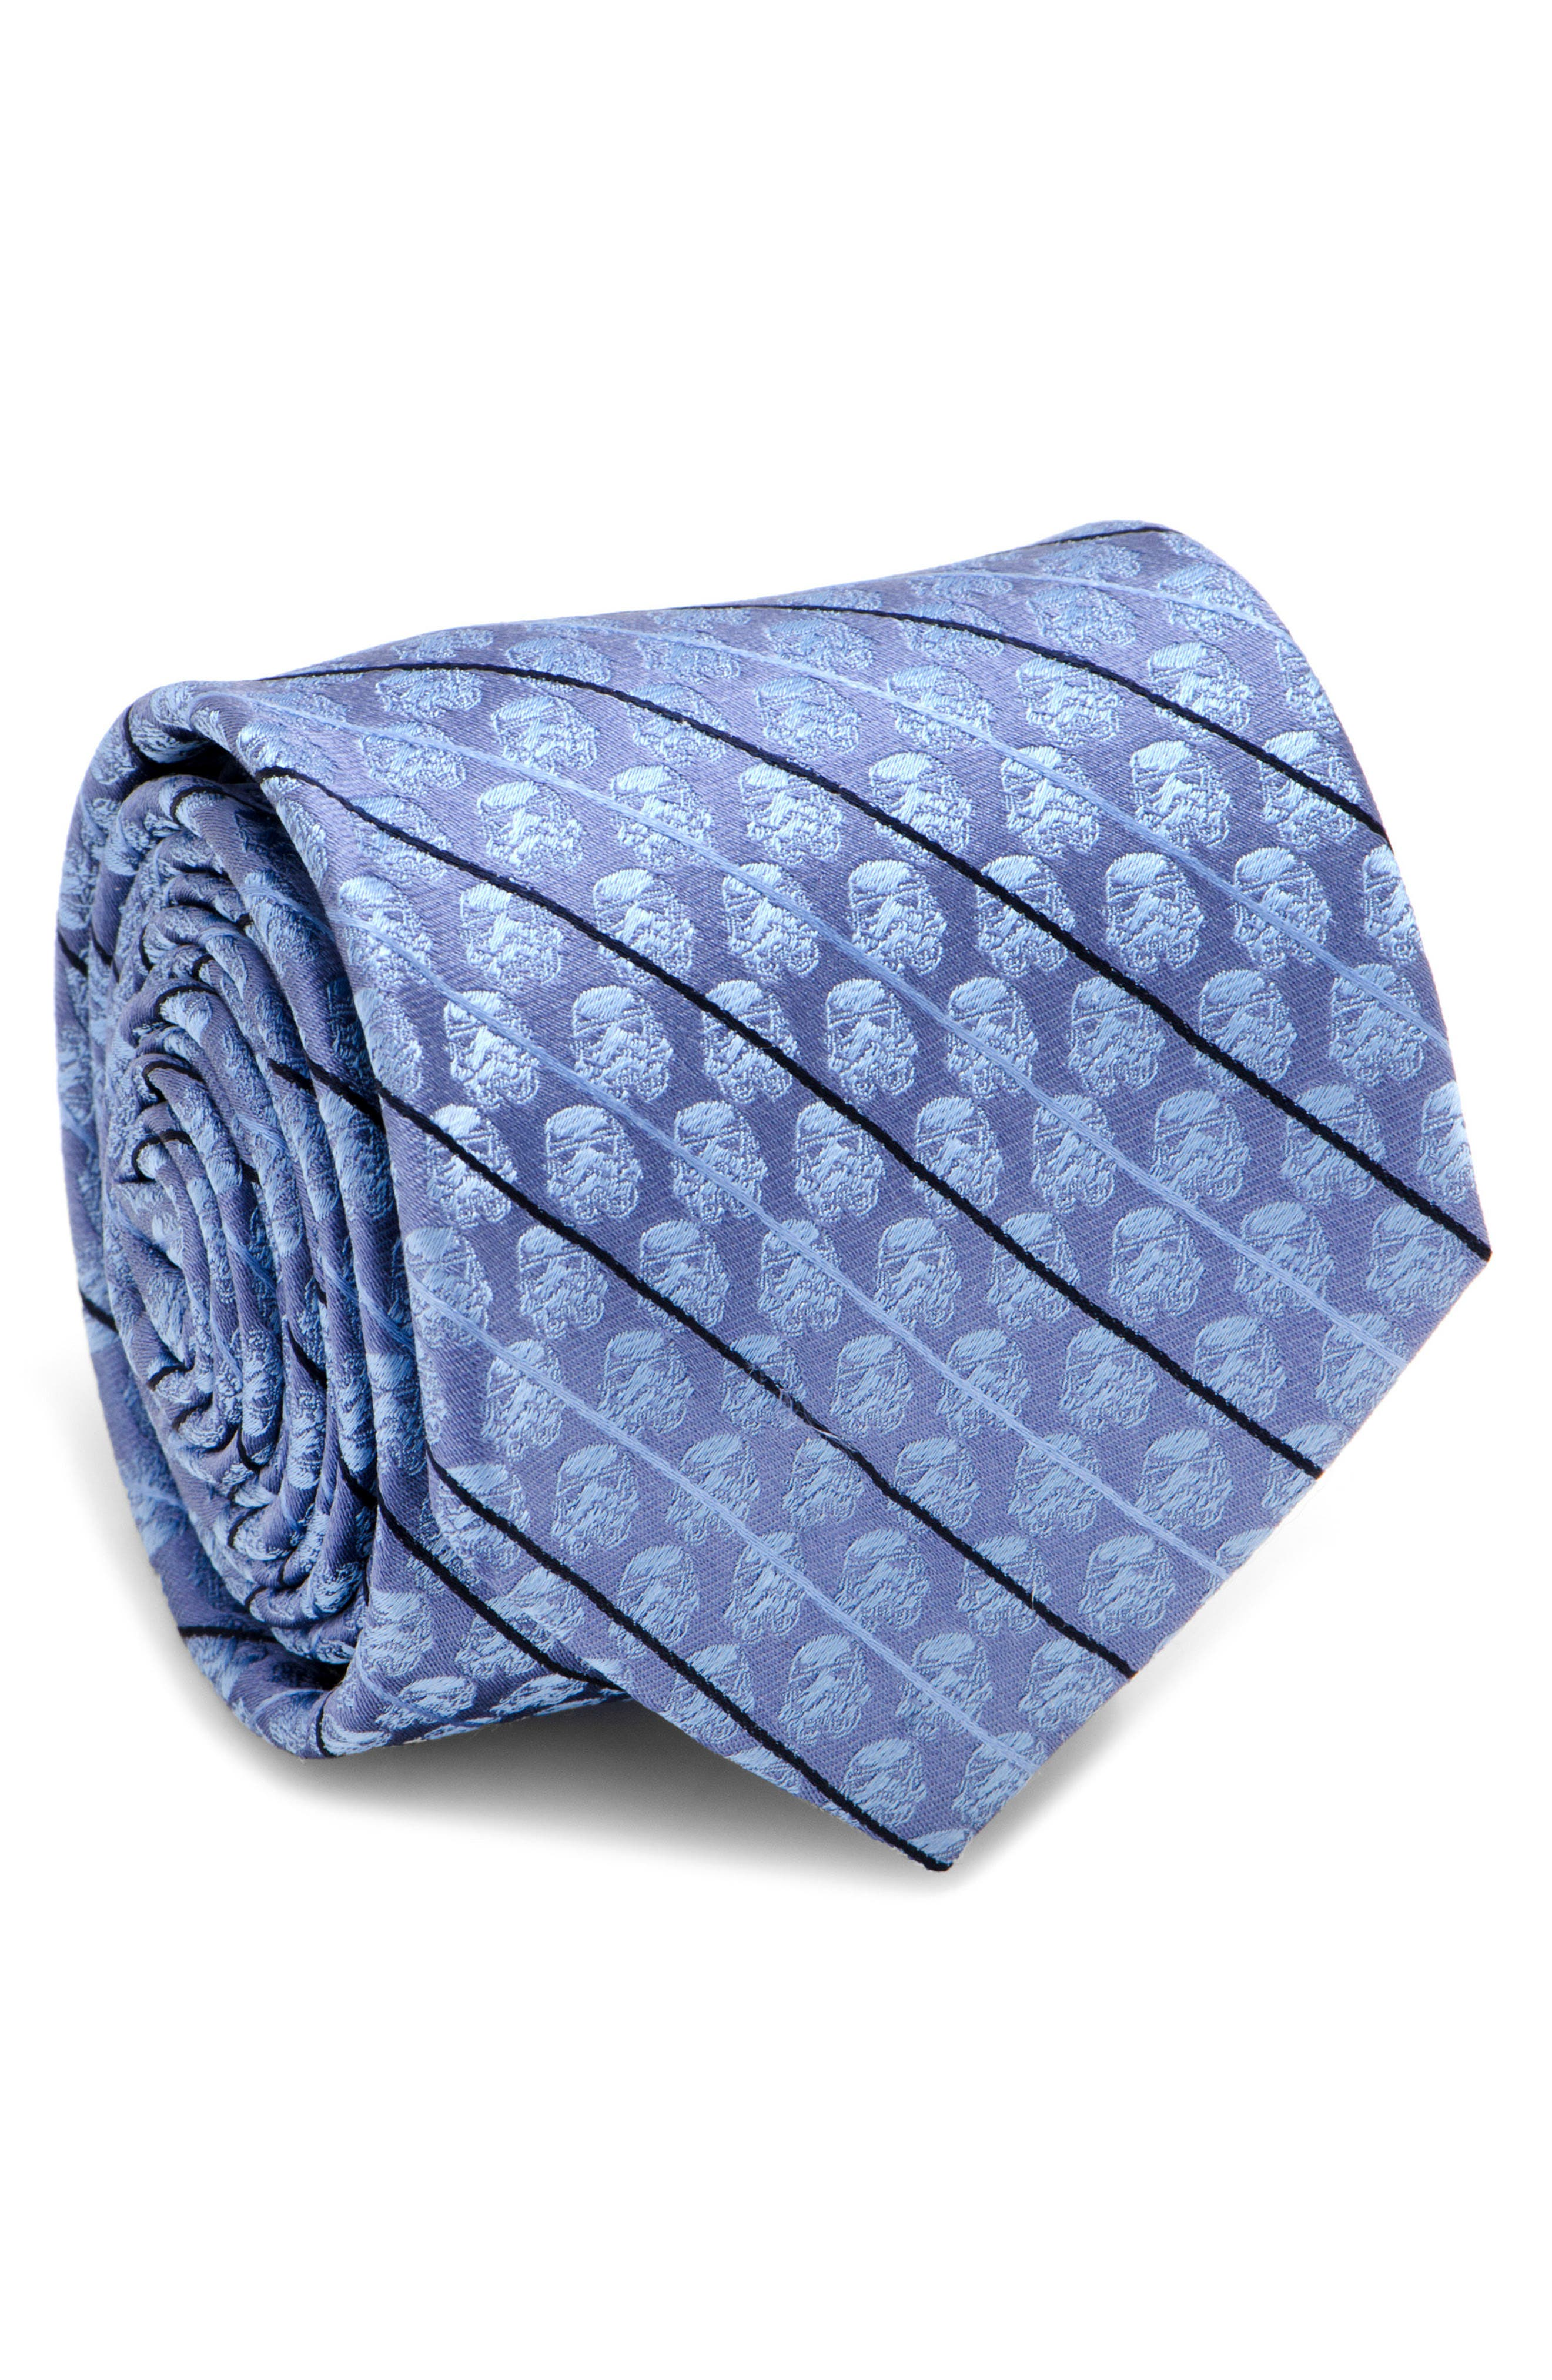 Storm Trooper Silk Tie,                         Main,                         color, Blue